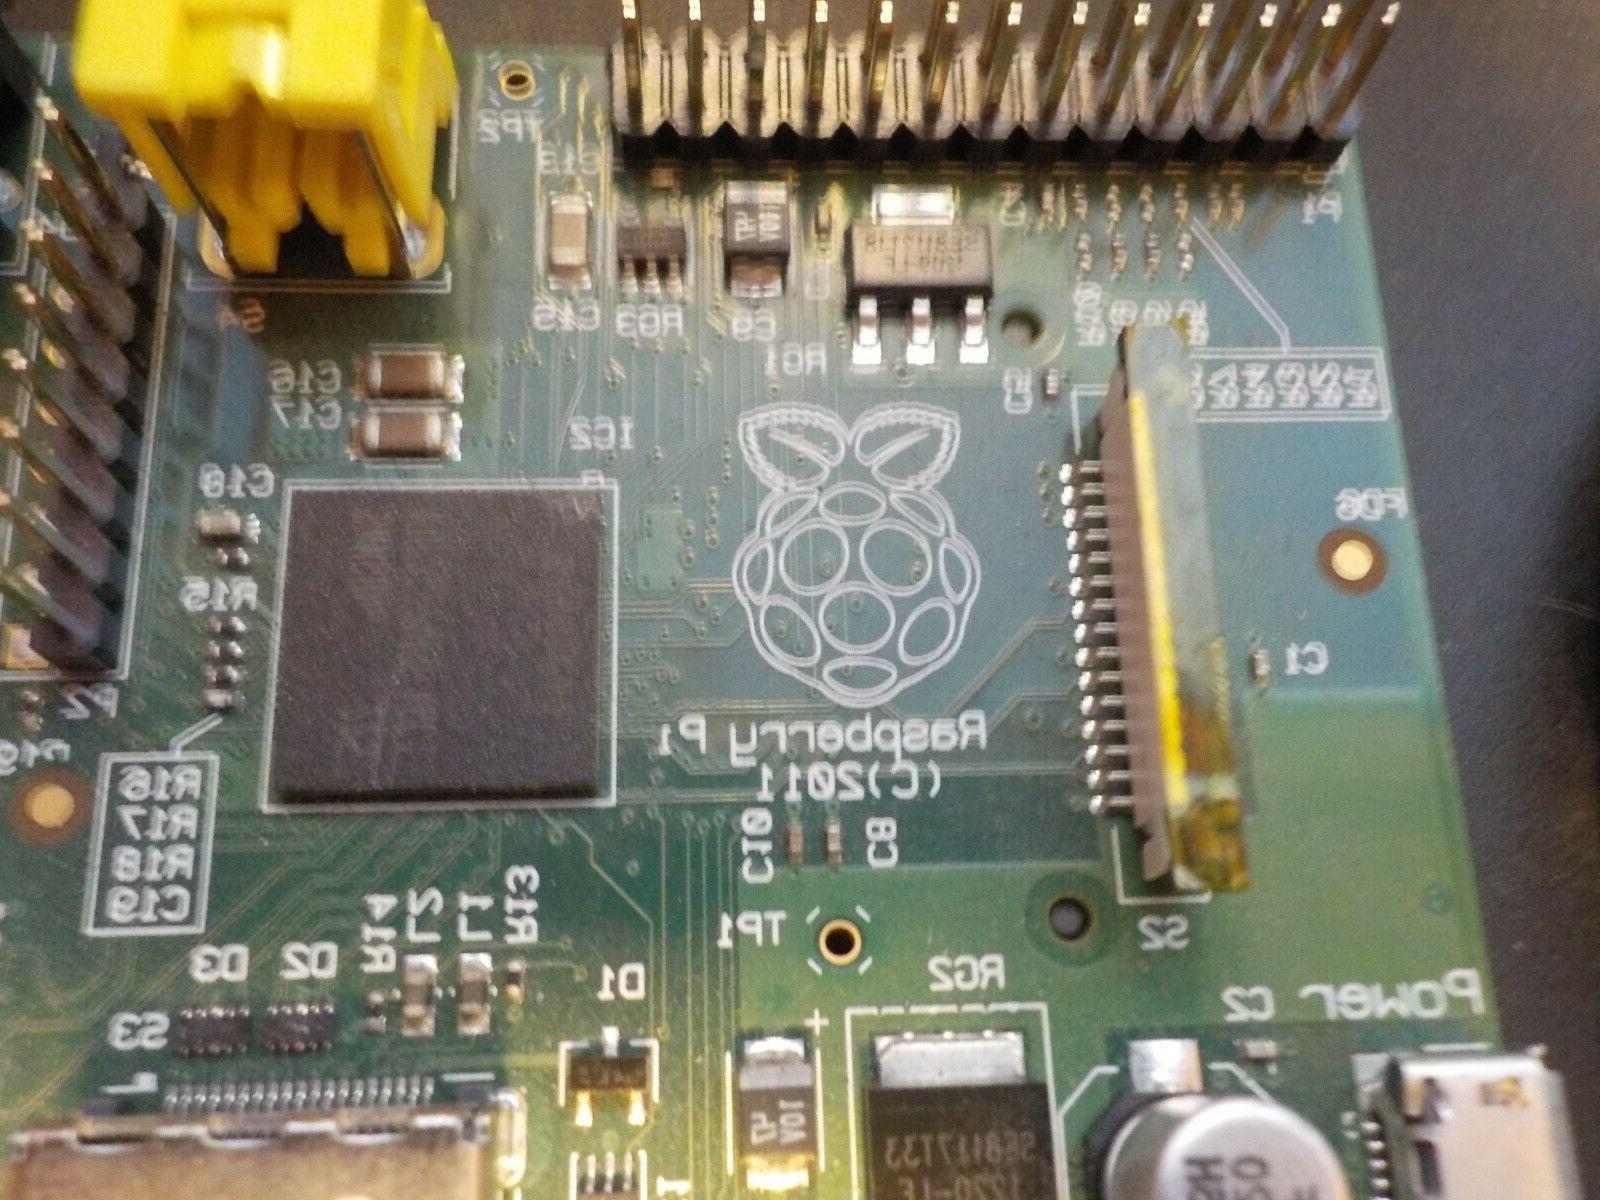 Raspberry Model B 2011 with